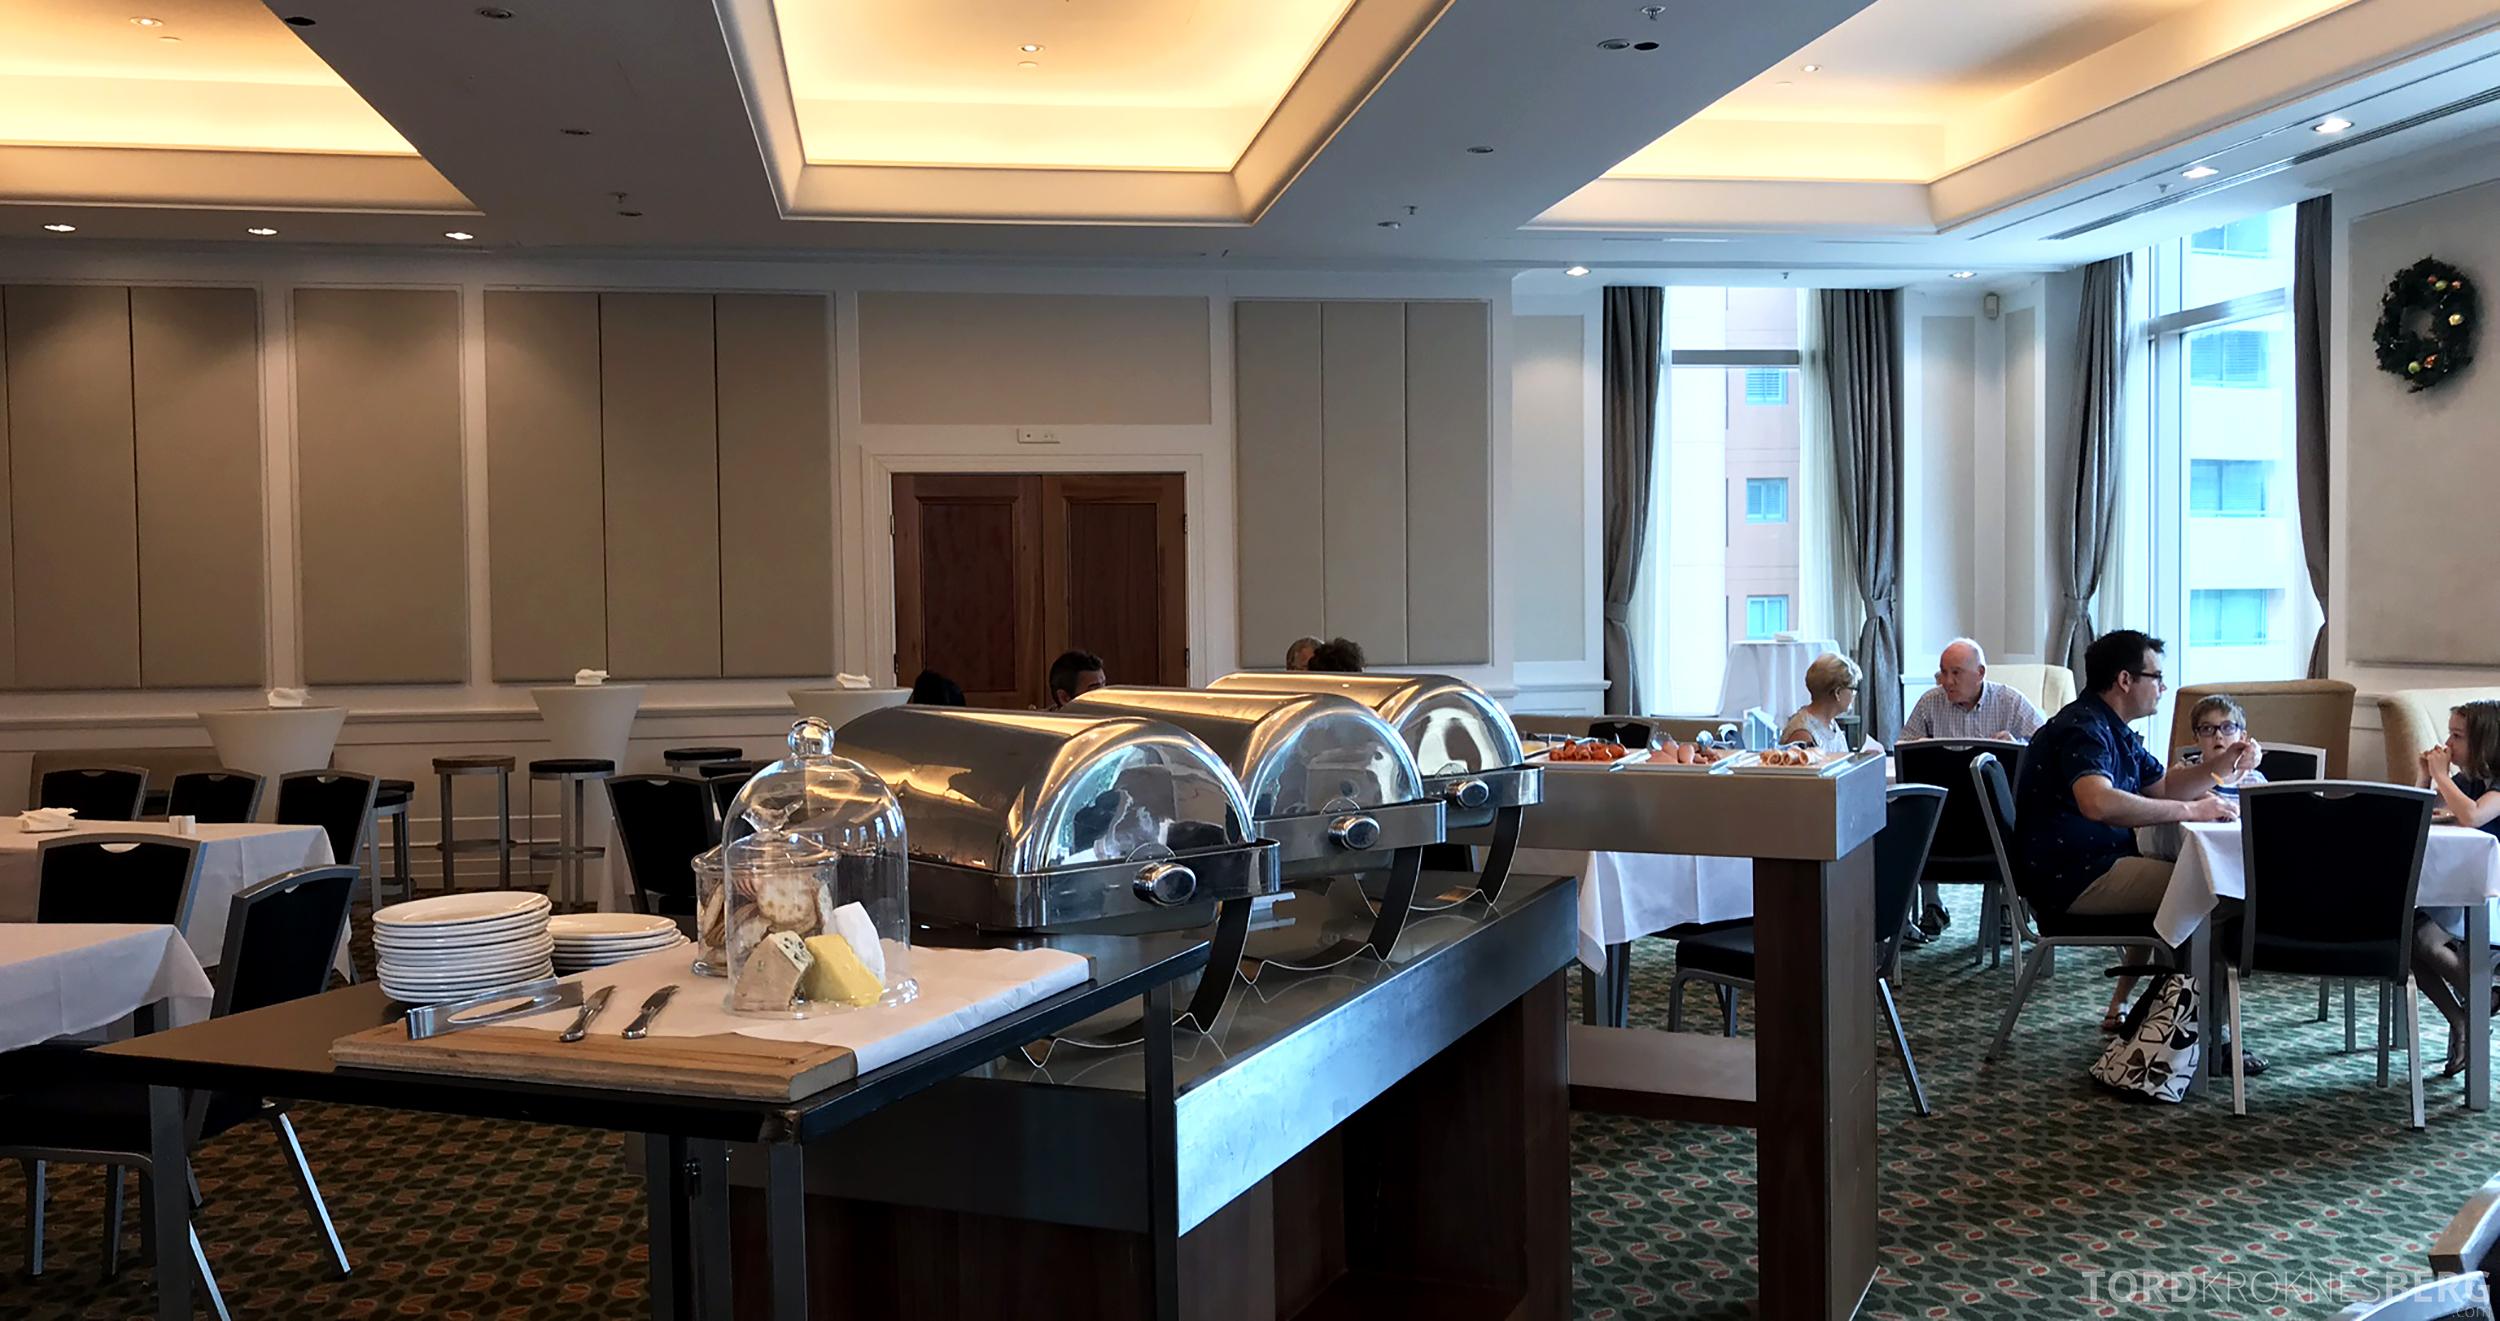 Brisbane Marriott Hotel Executive Lounge frokost ballroom